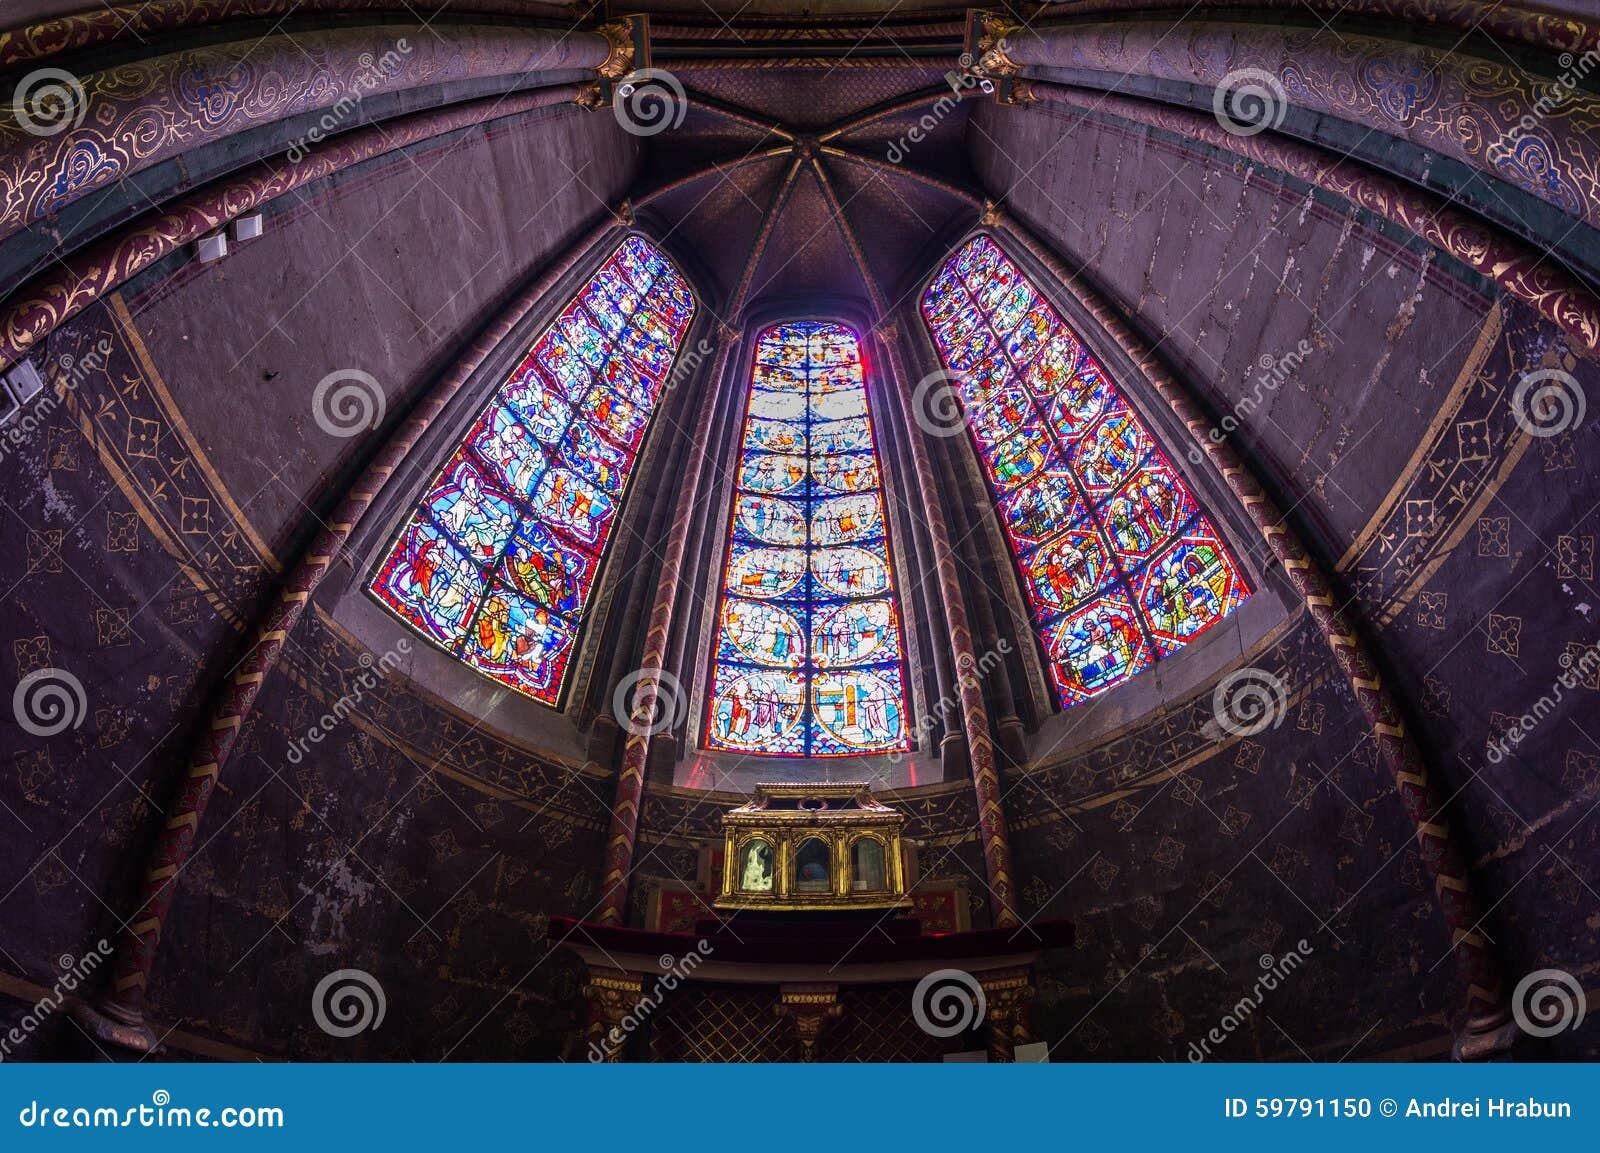 Мозаика в соборе Буржа